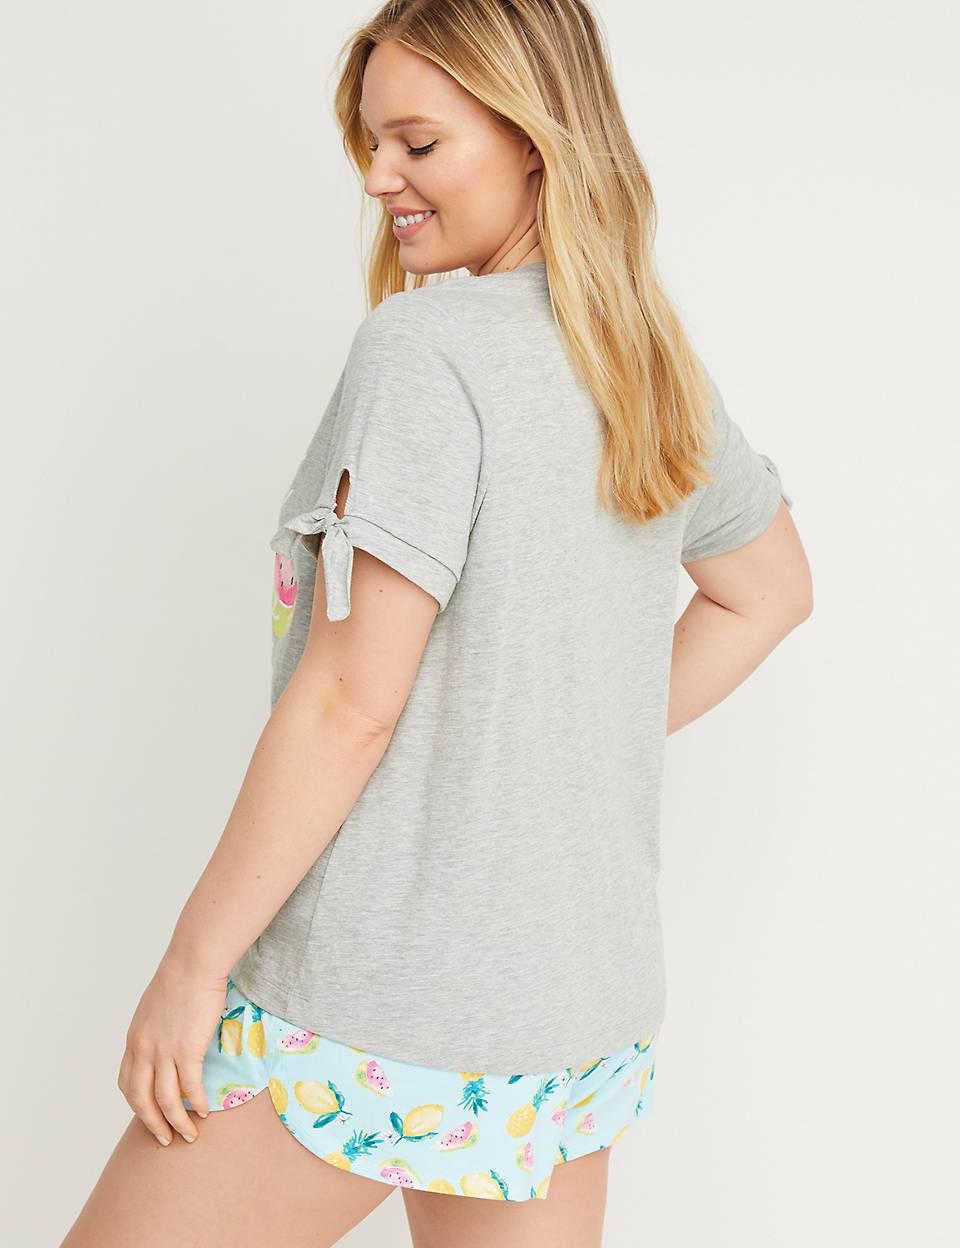 27b04cb1b Graphic Tee & Short PJ Set - Tie Sleeve | Cacique